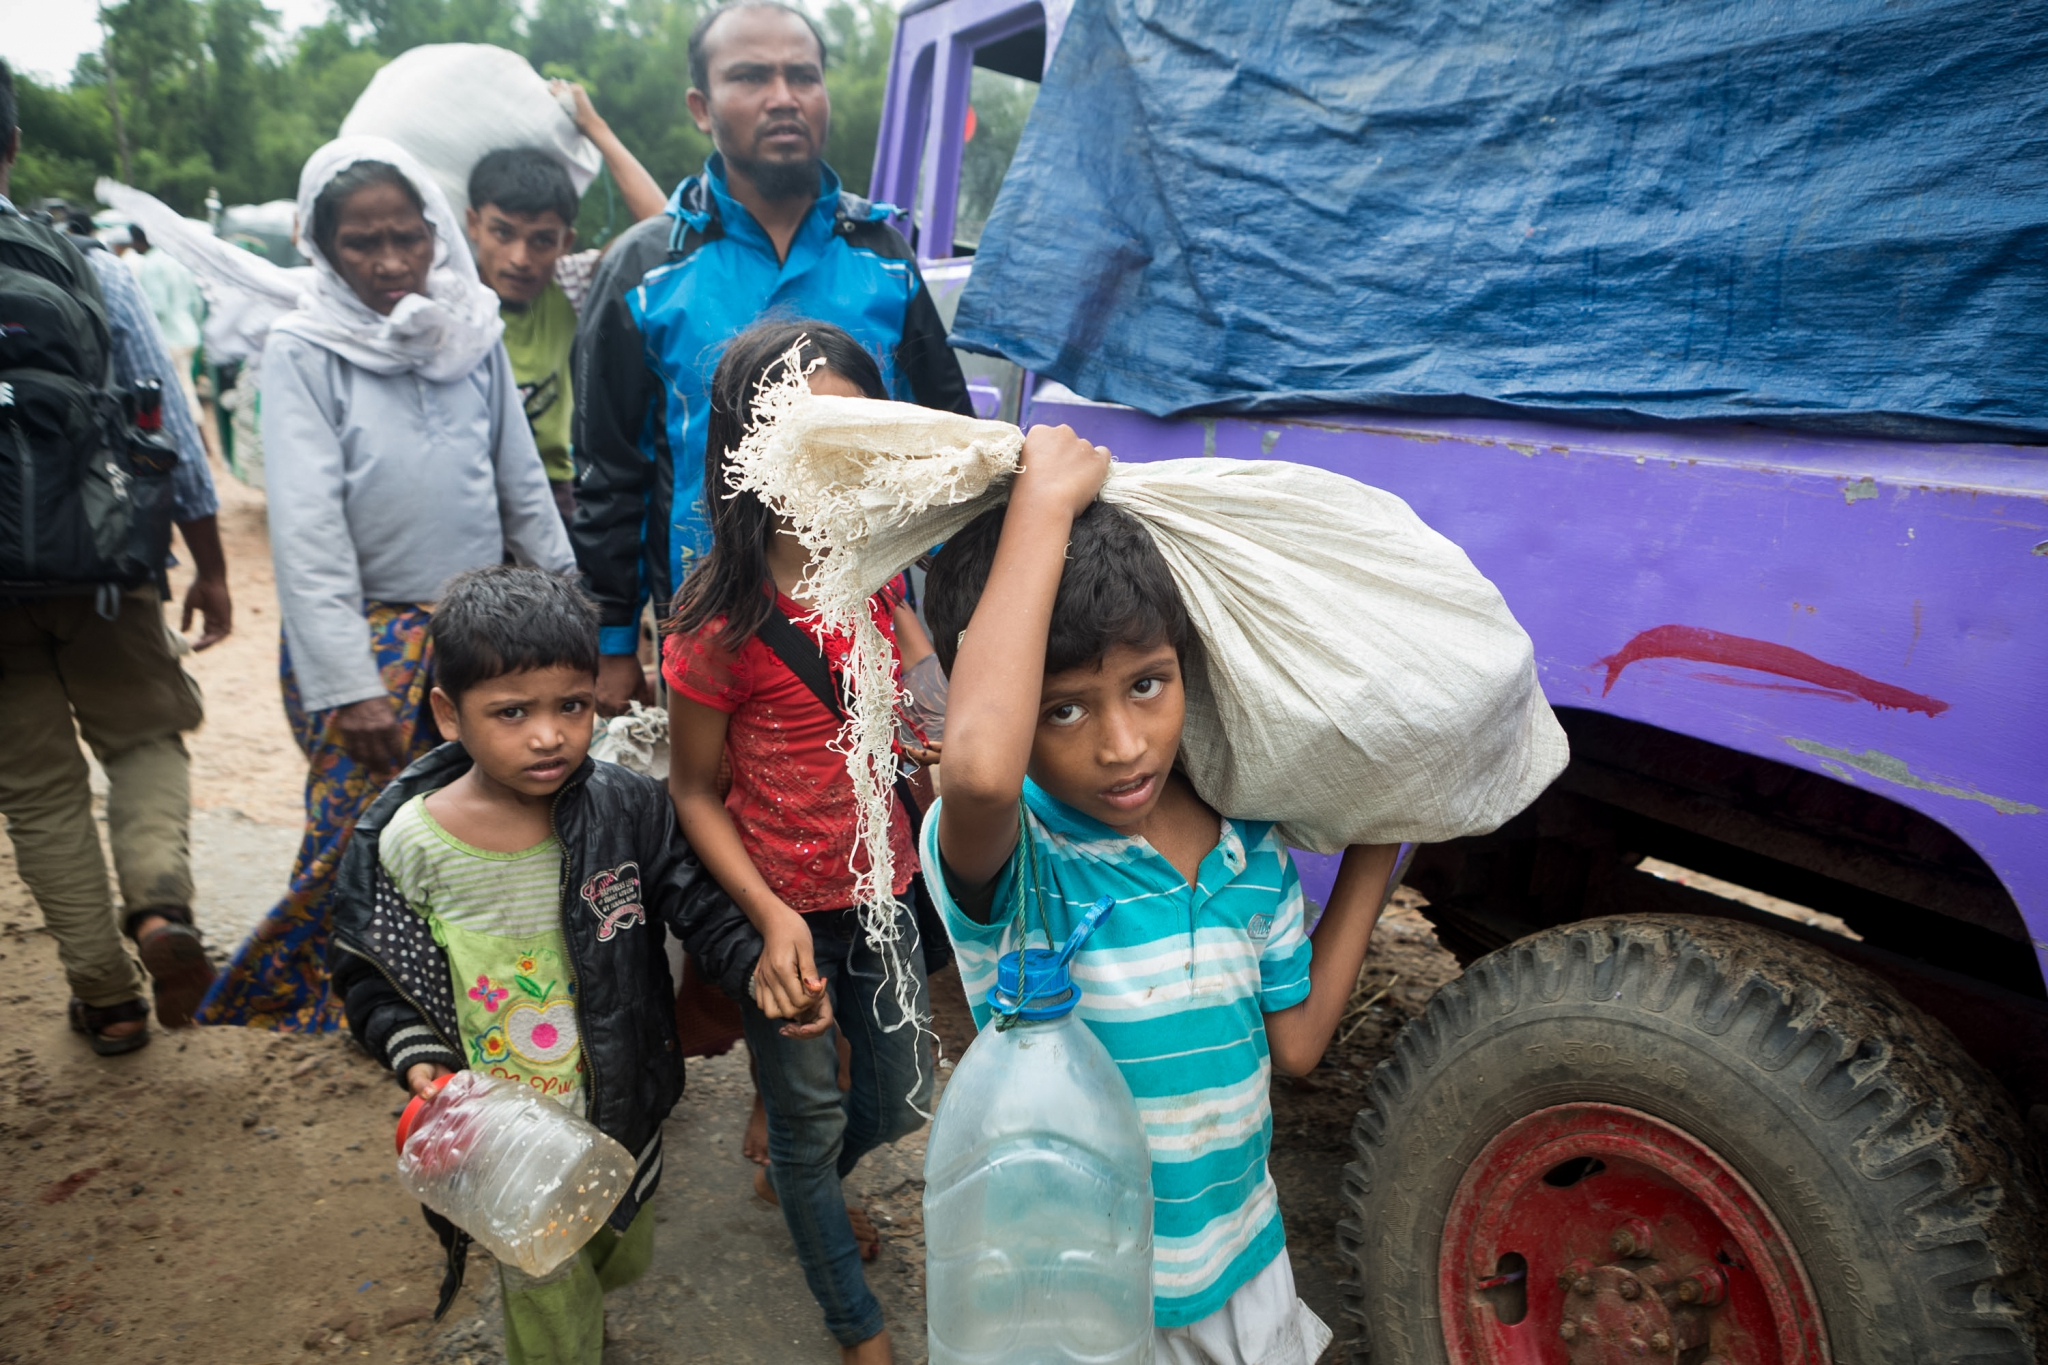 reportage,agence,presse,zeppelin,bangladesh,birmanie,rohingyas,photographe,suman paul,défi,prix nobel,aung san suu kyi,bouddhisme,islam